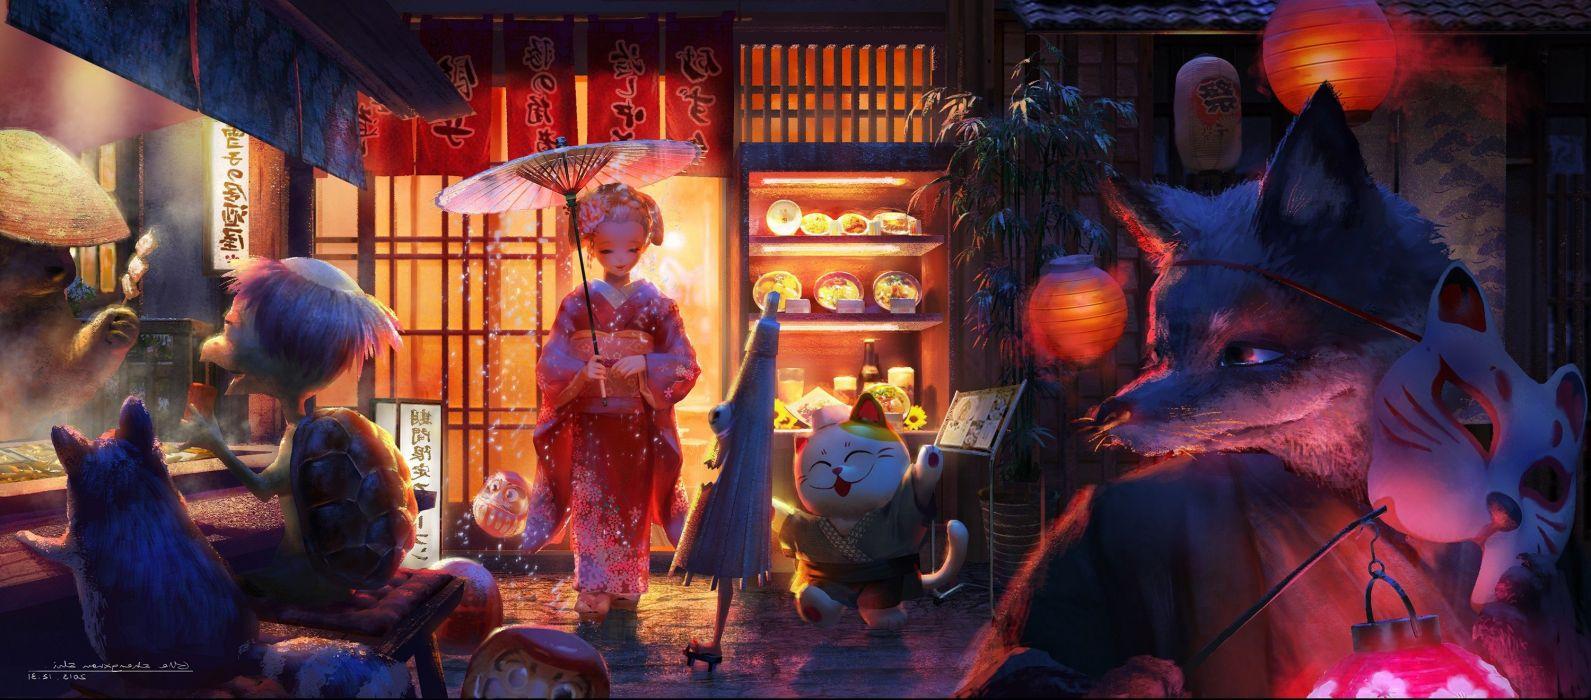 animals food Fox kimono Lantern mask Original Characters turtle umbrella wallpaper